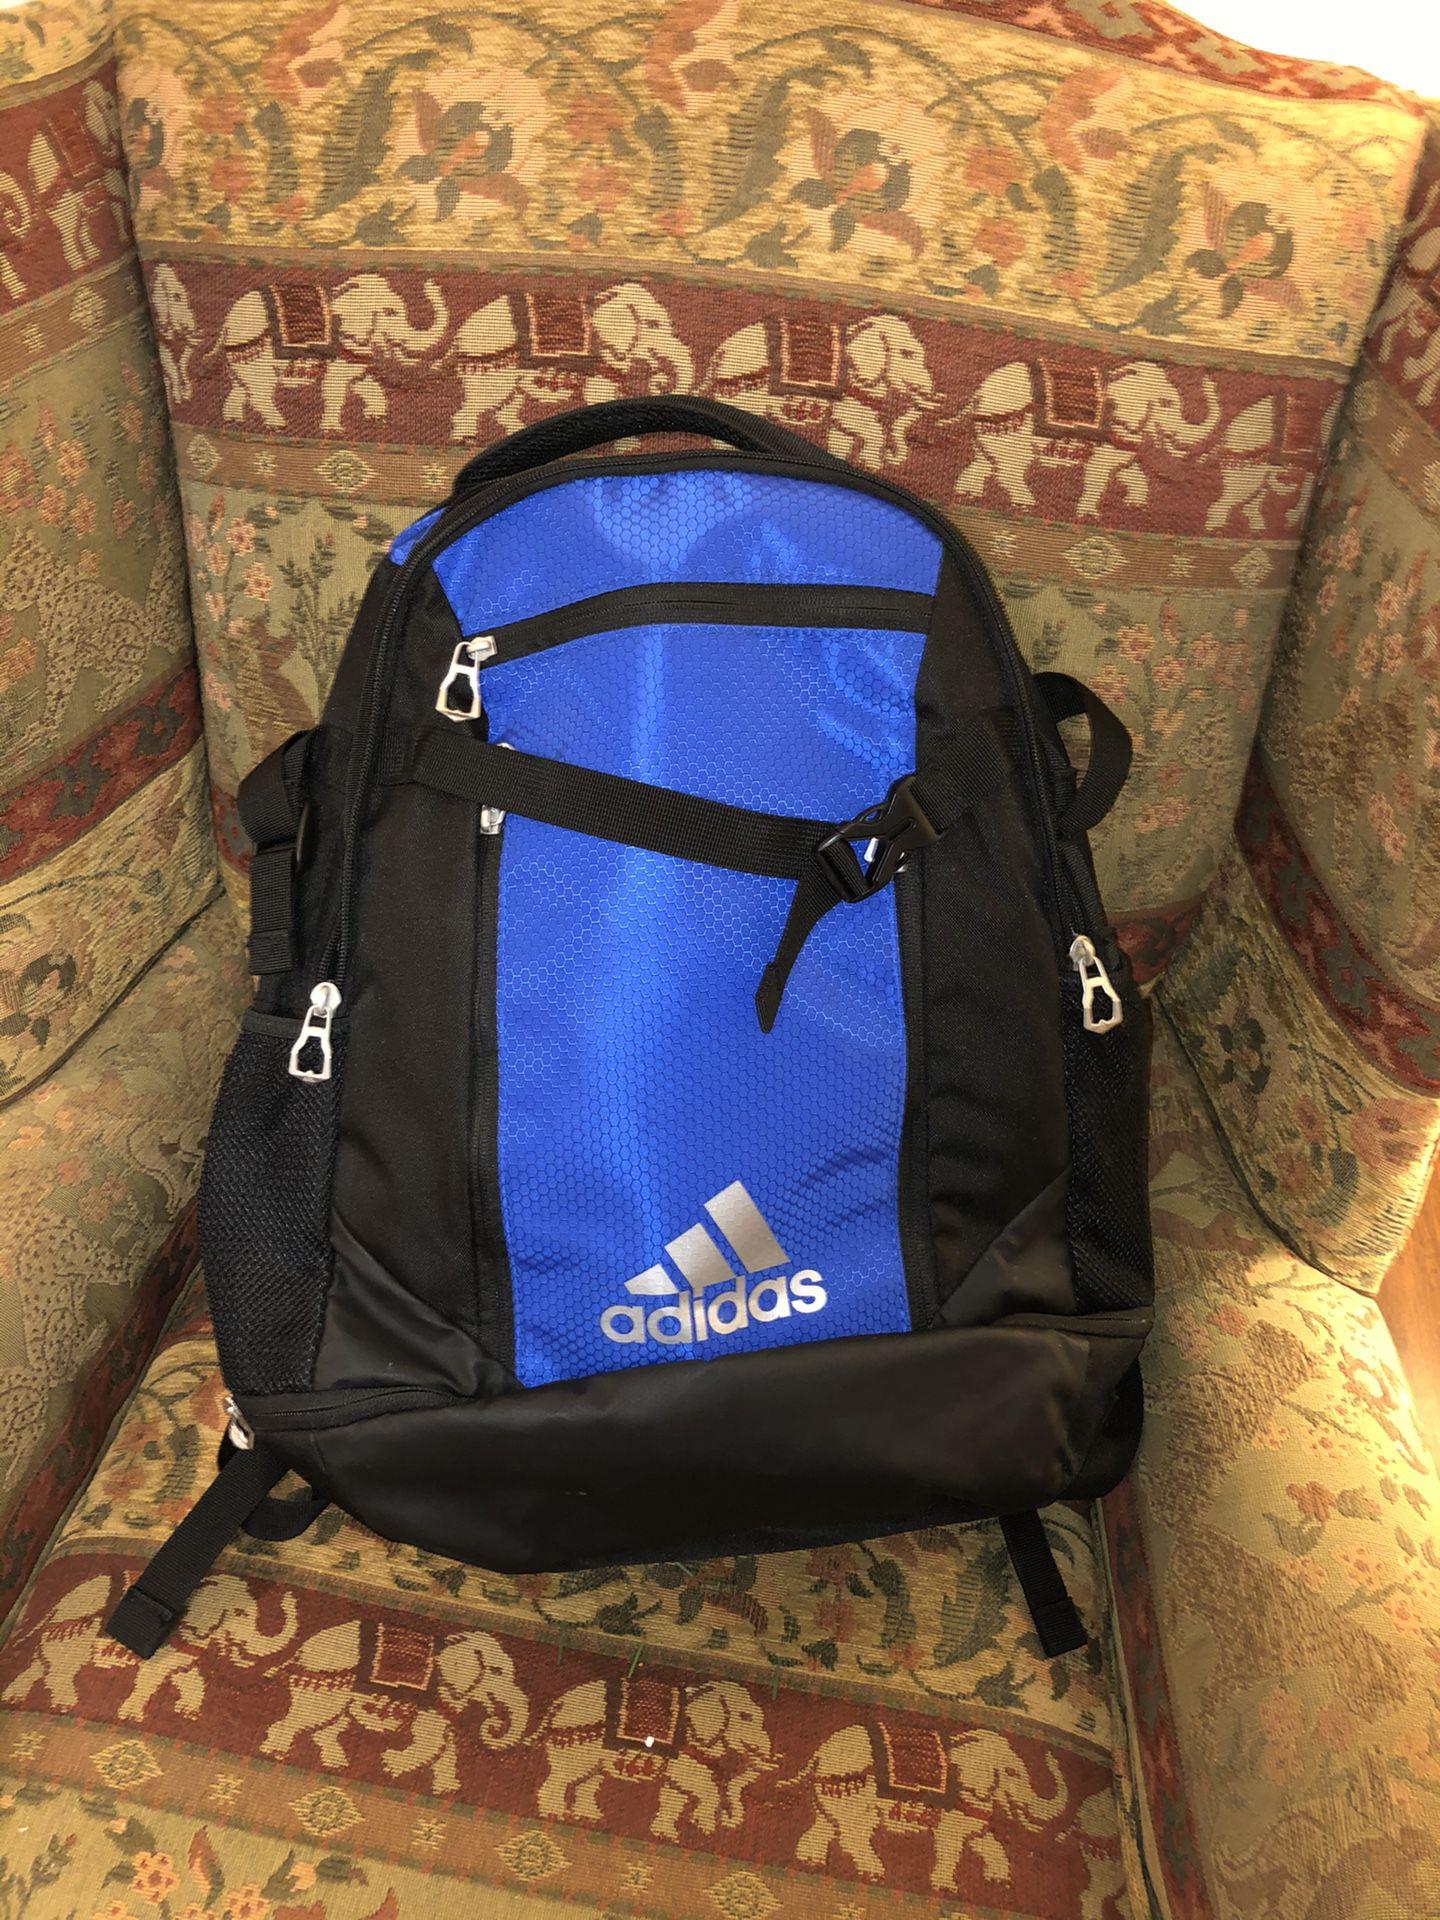 Adidas Baseball/backpack/batpack